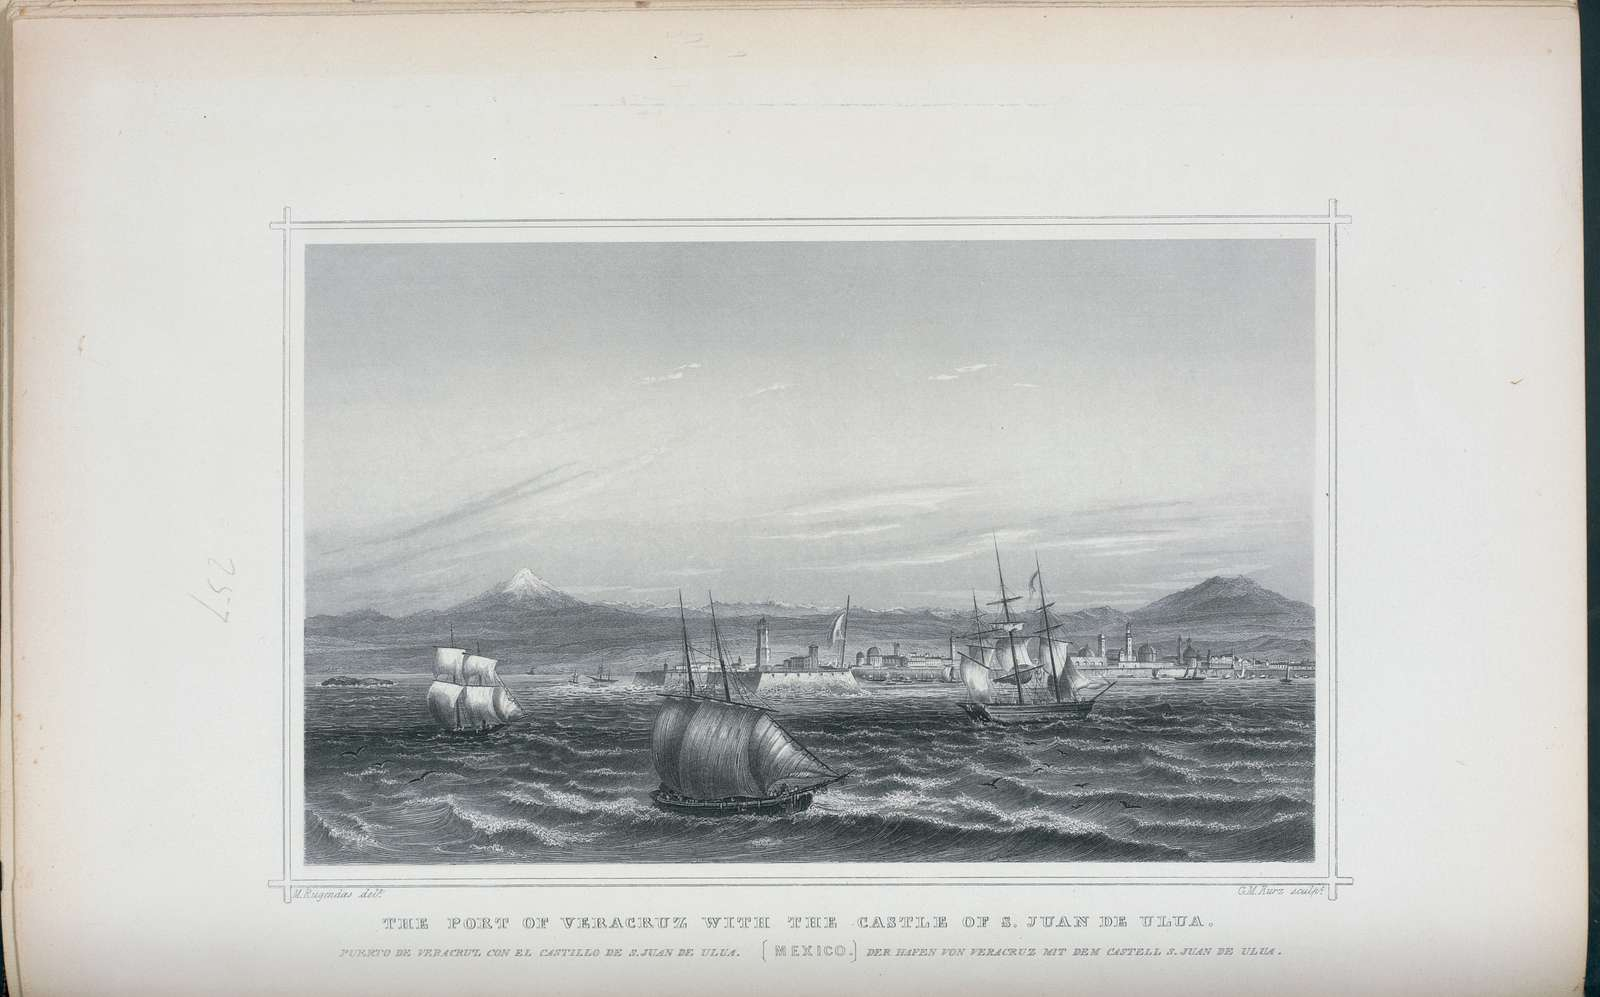 The port of Veracruz with the castle of S. Juan de Ulua, Mexico.